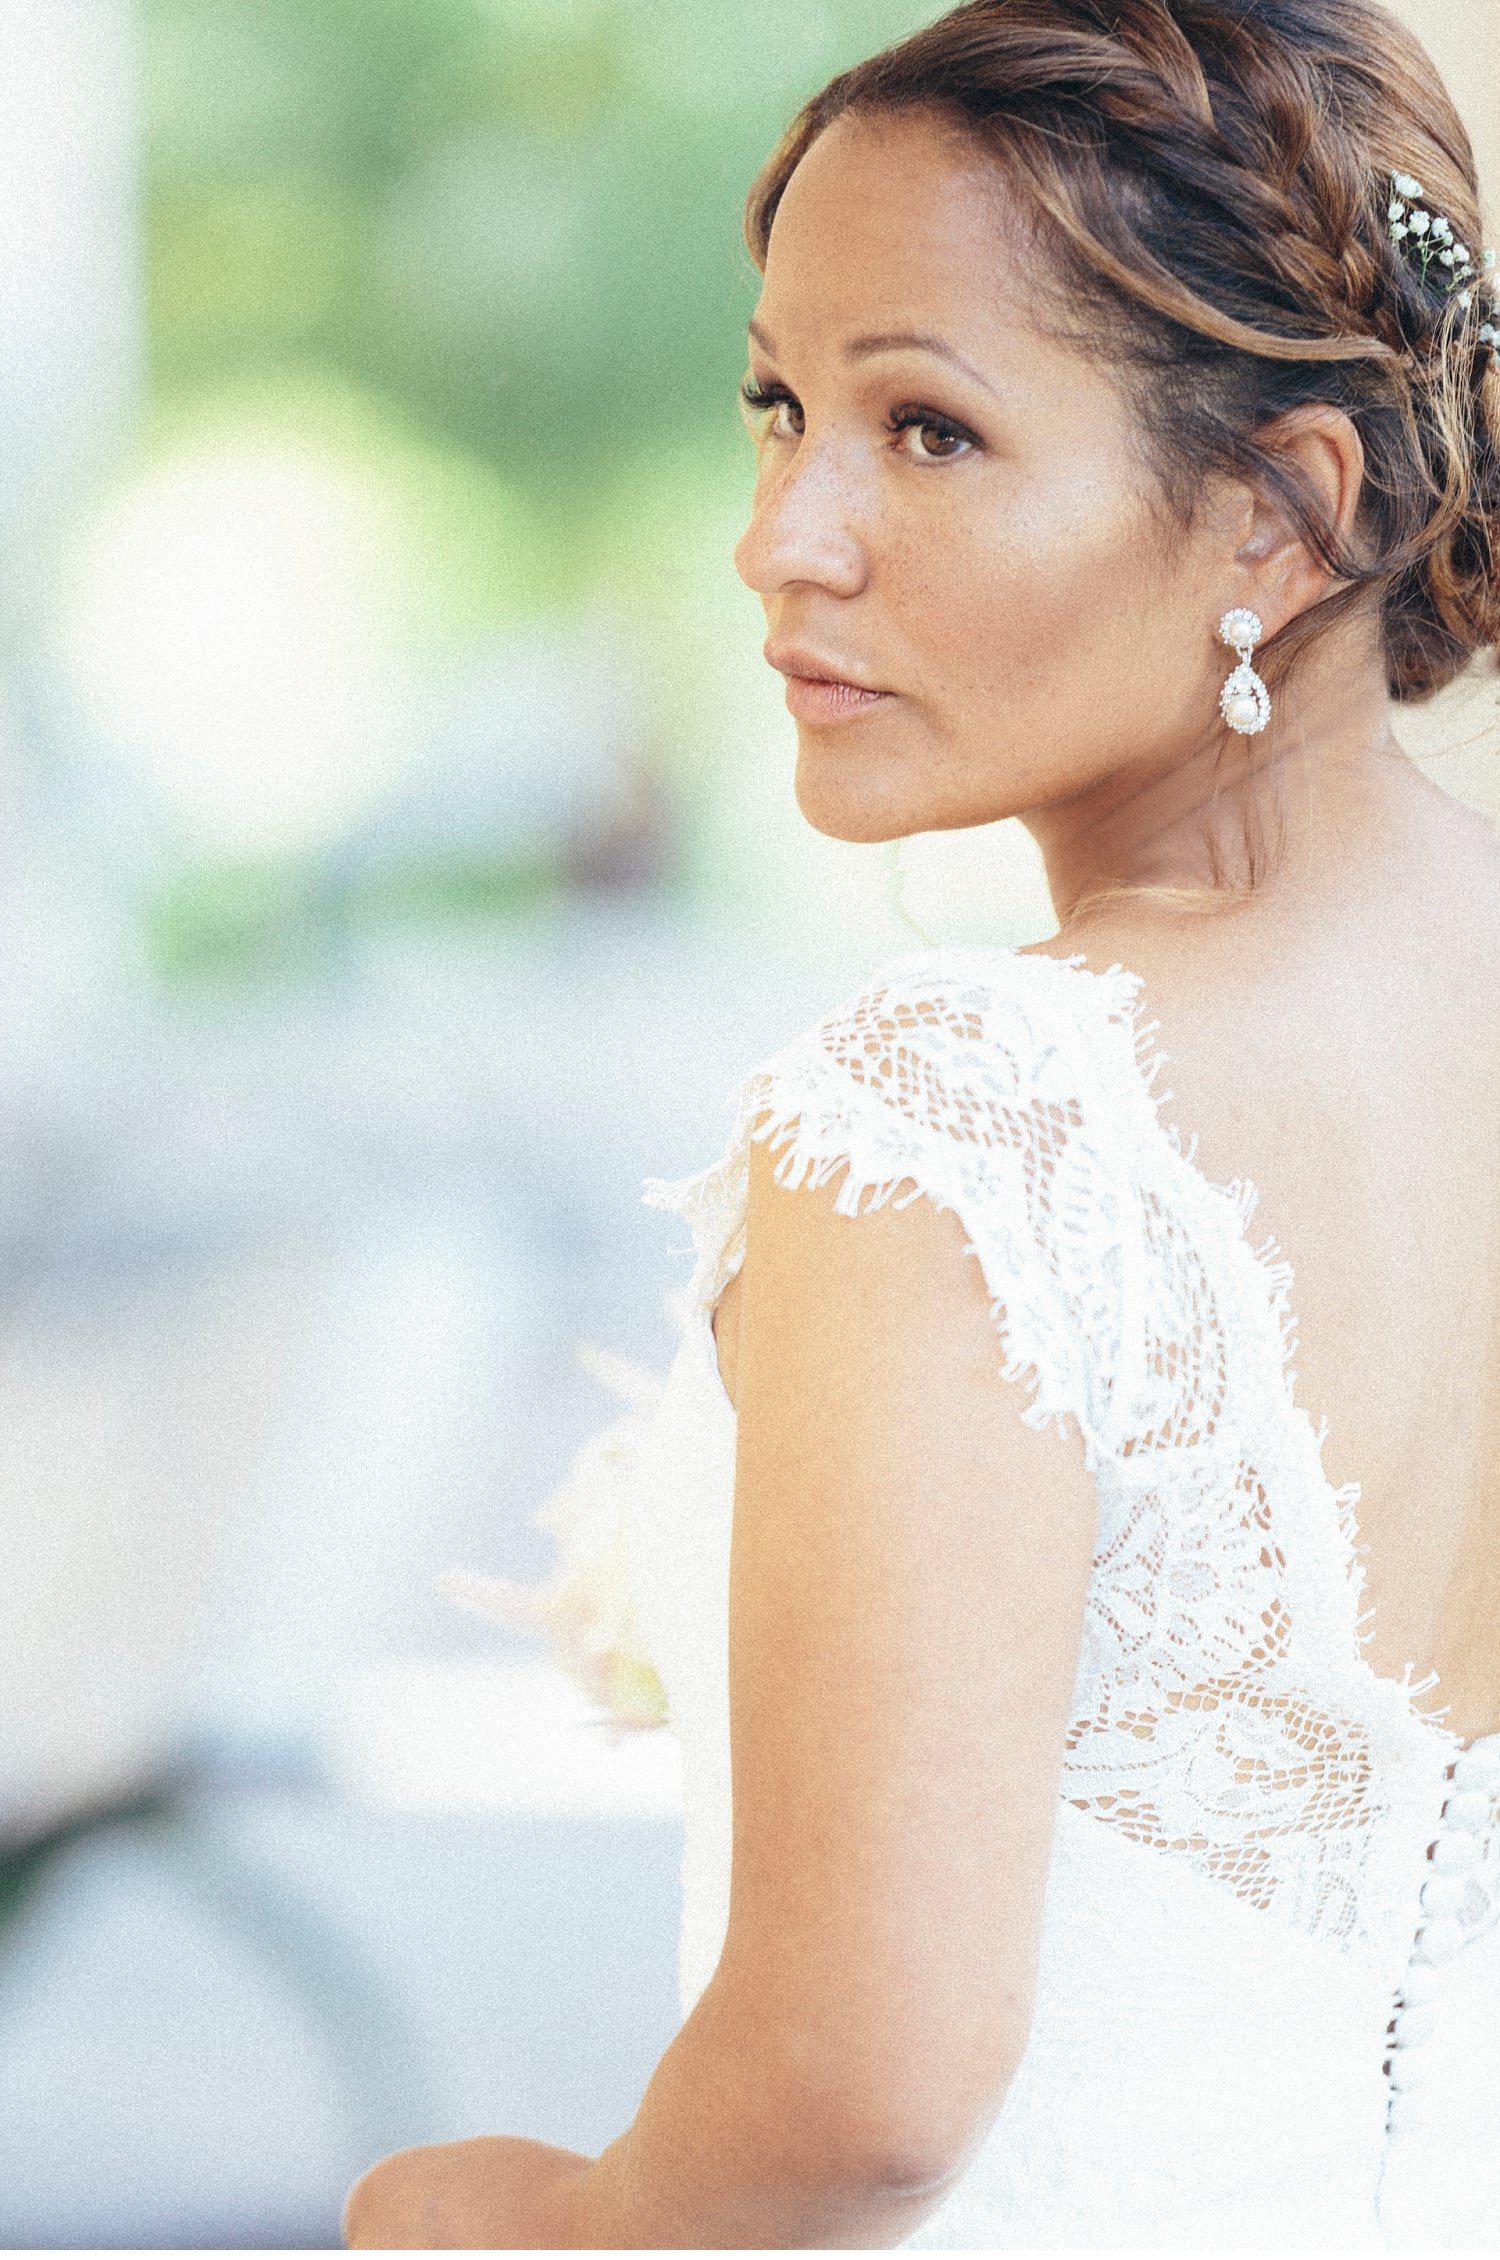 linnea johan 170 - Linnea & Johan Hedberg's Wedding wedding